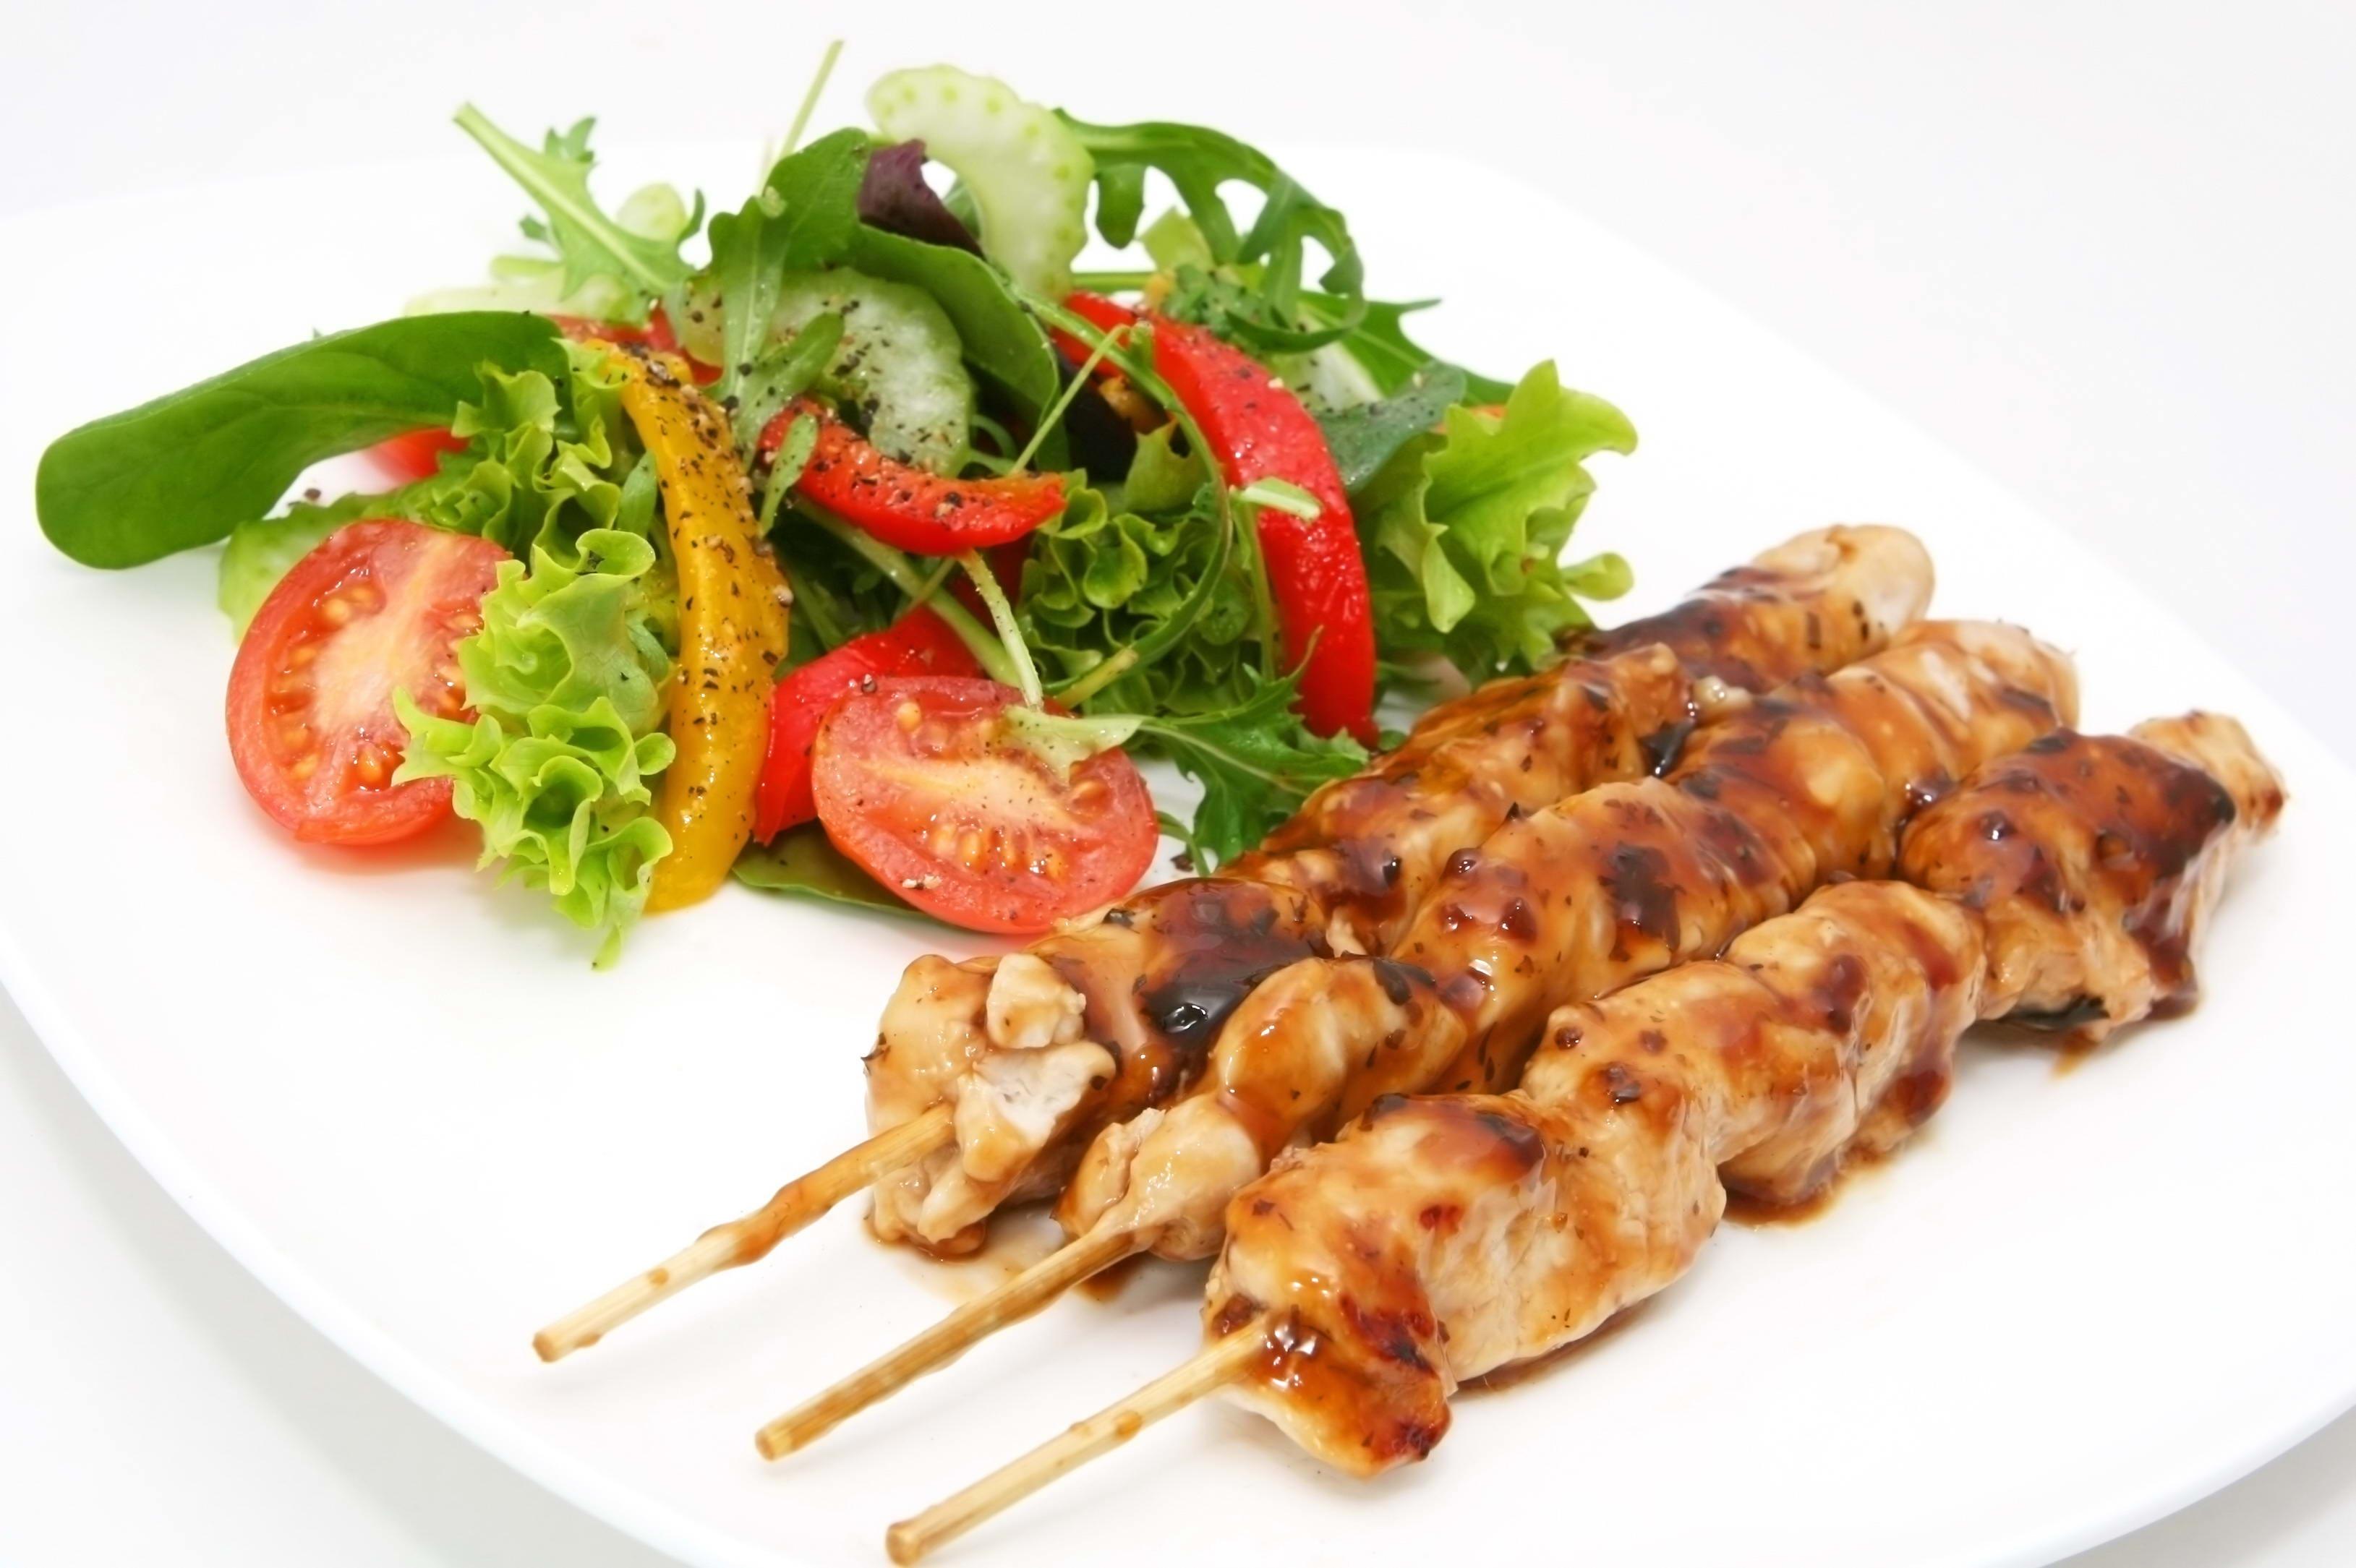 Fond d 39 cran aliments fond blanc moi vert assiette for Fond blanc cuisine